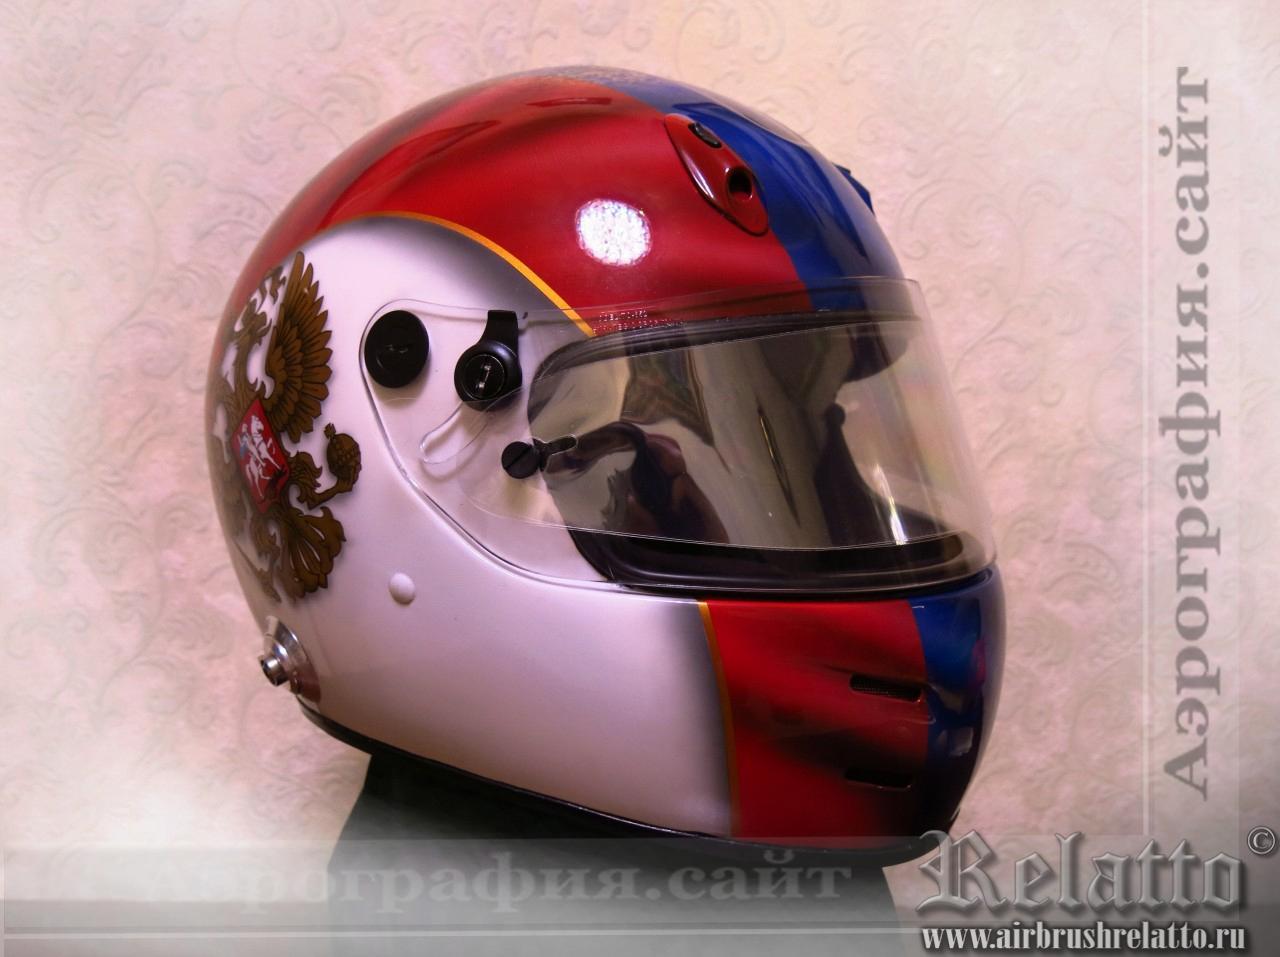 Аэрография на шлеме Формула-1